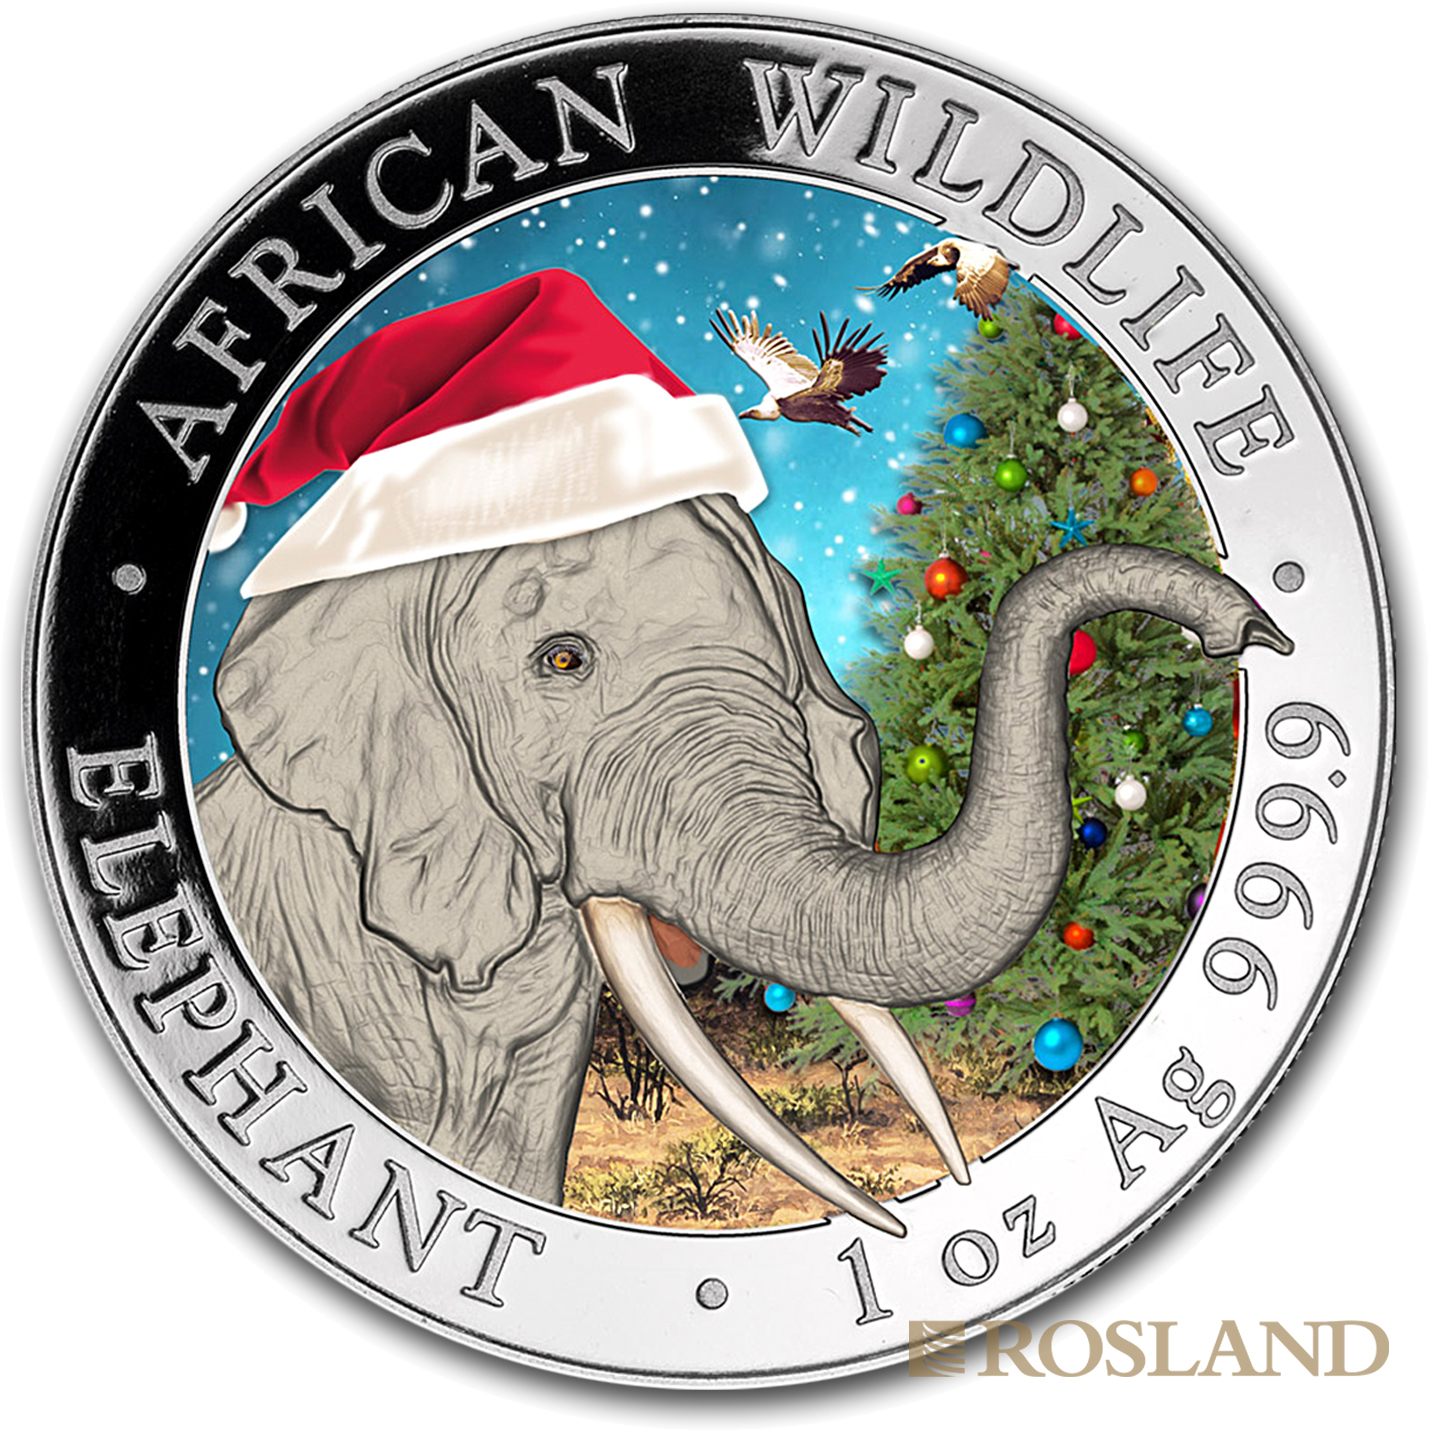 1 Unze Silbermünze Somalia Elefant 2018 Weihnachten Schneekugel (Koloriert, Box, Zertifikat)